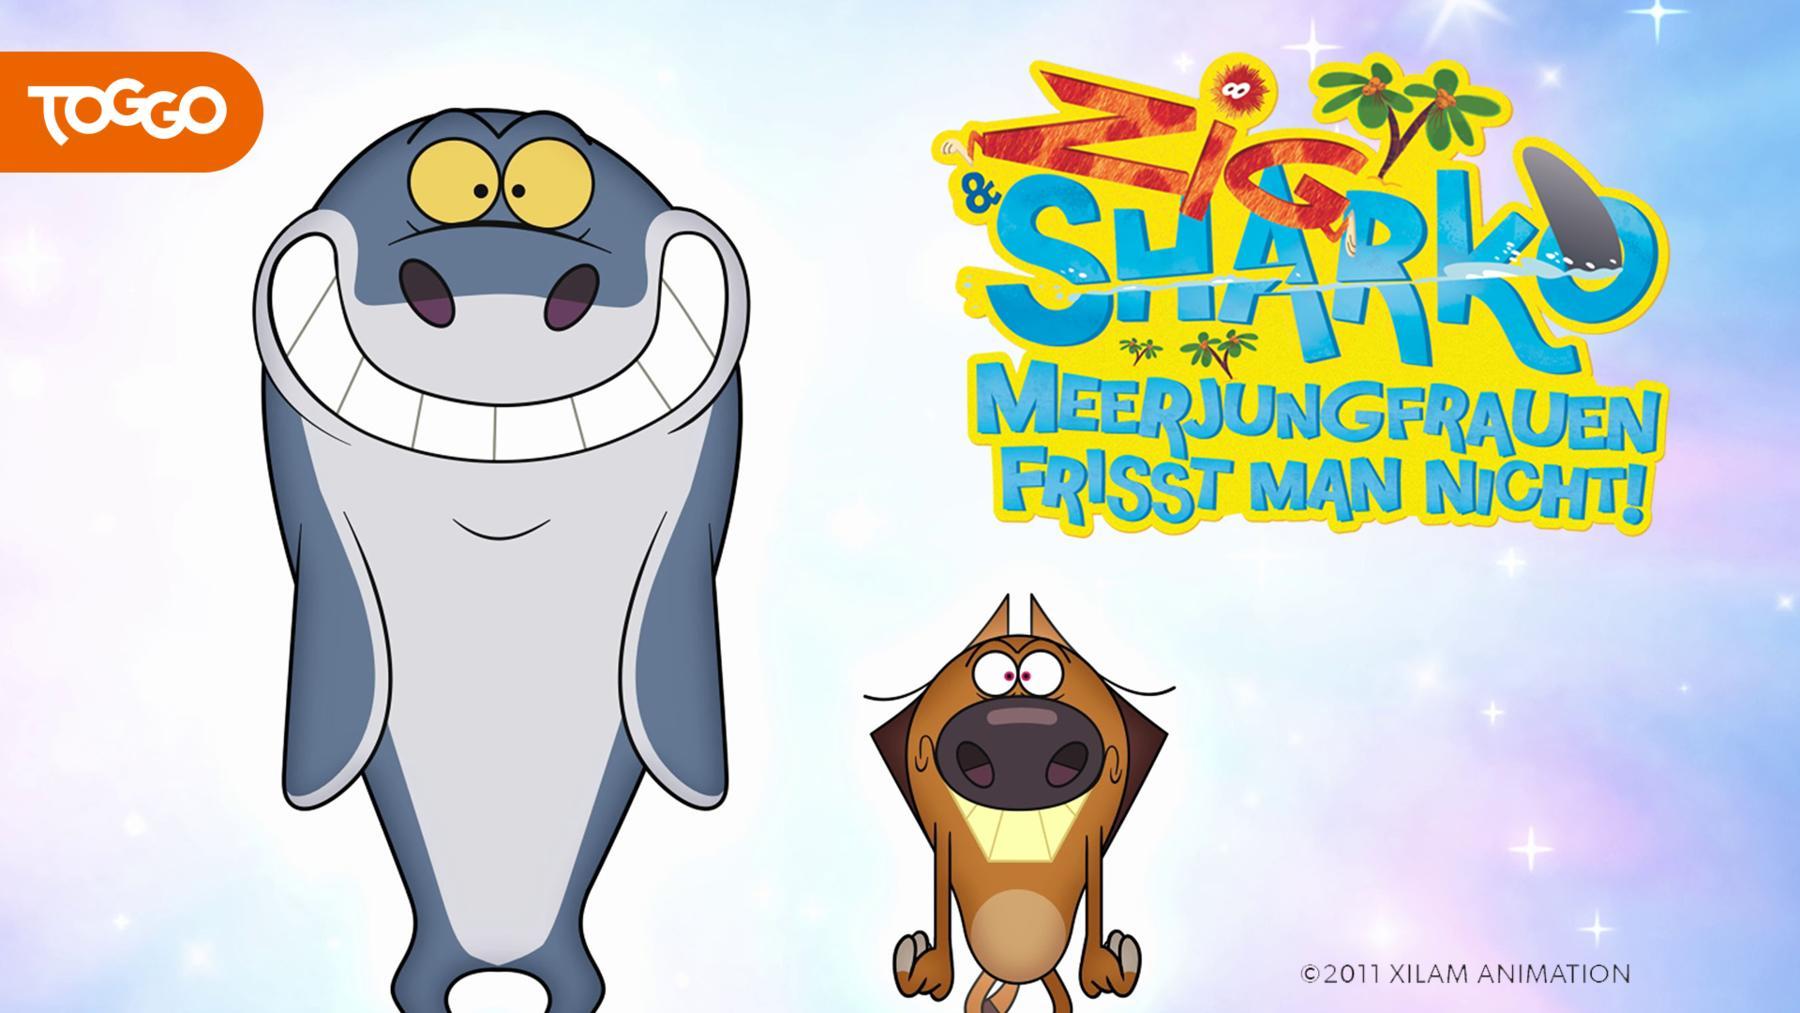 Zig & Sharko - Meerjungfrauen frisst man nicht!